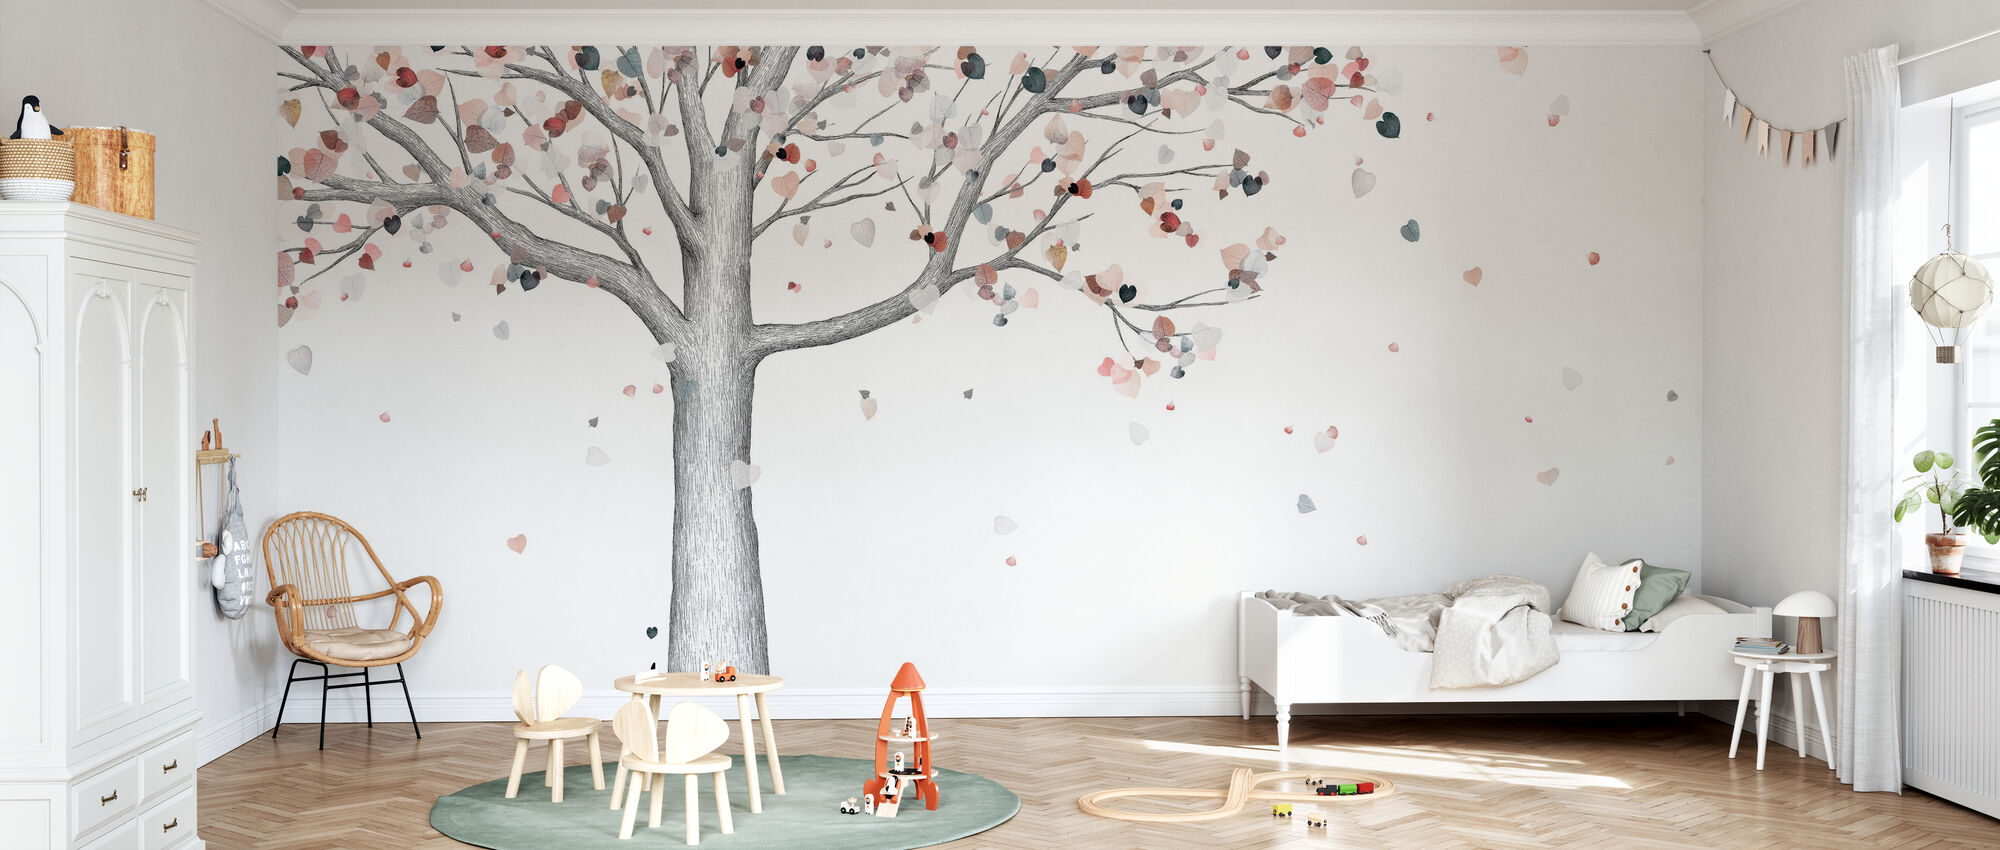 Herbst - Tapete - Kinderzimmer